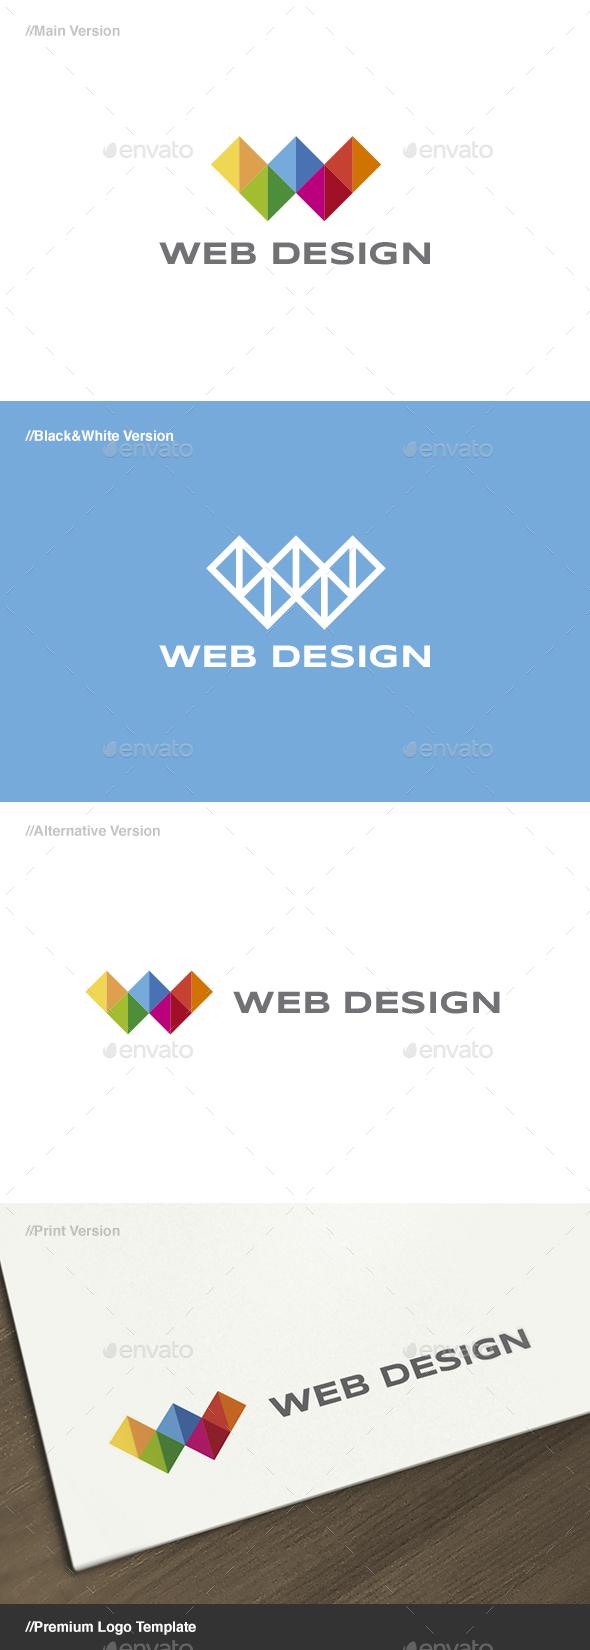 Web Design 3 - Letter W Logo